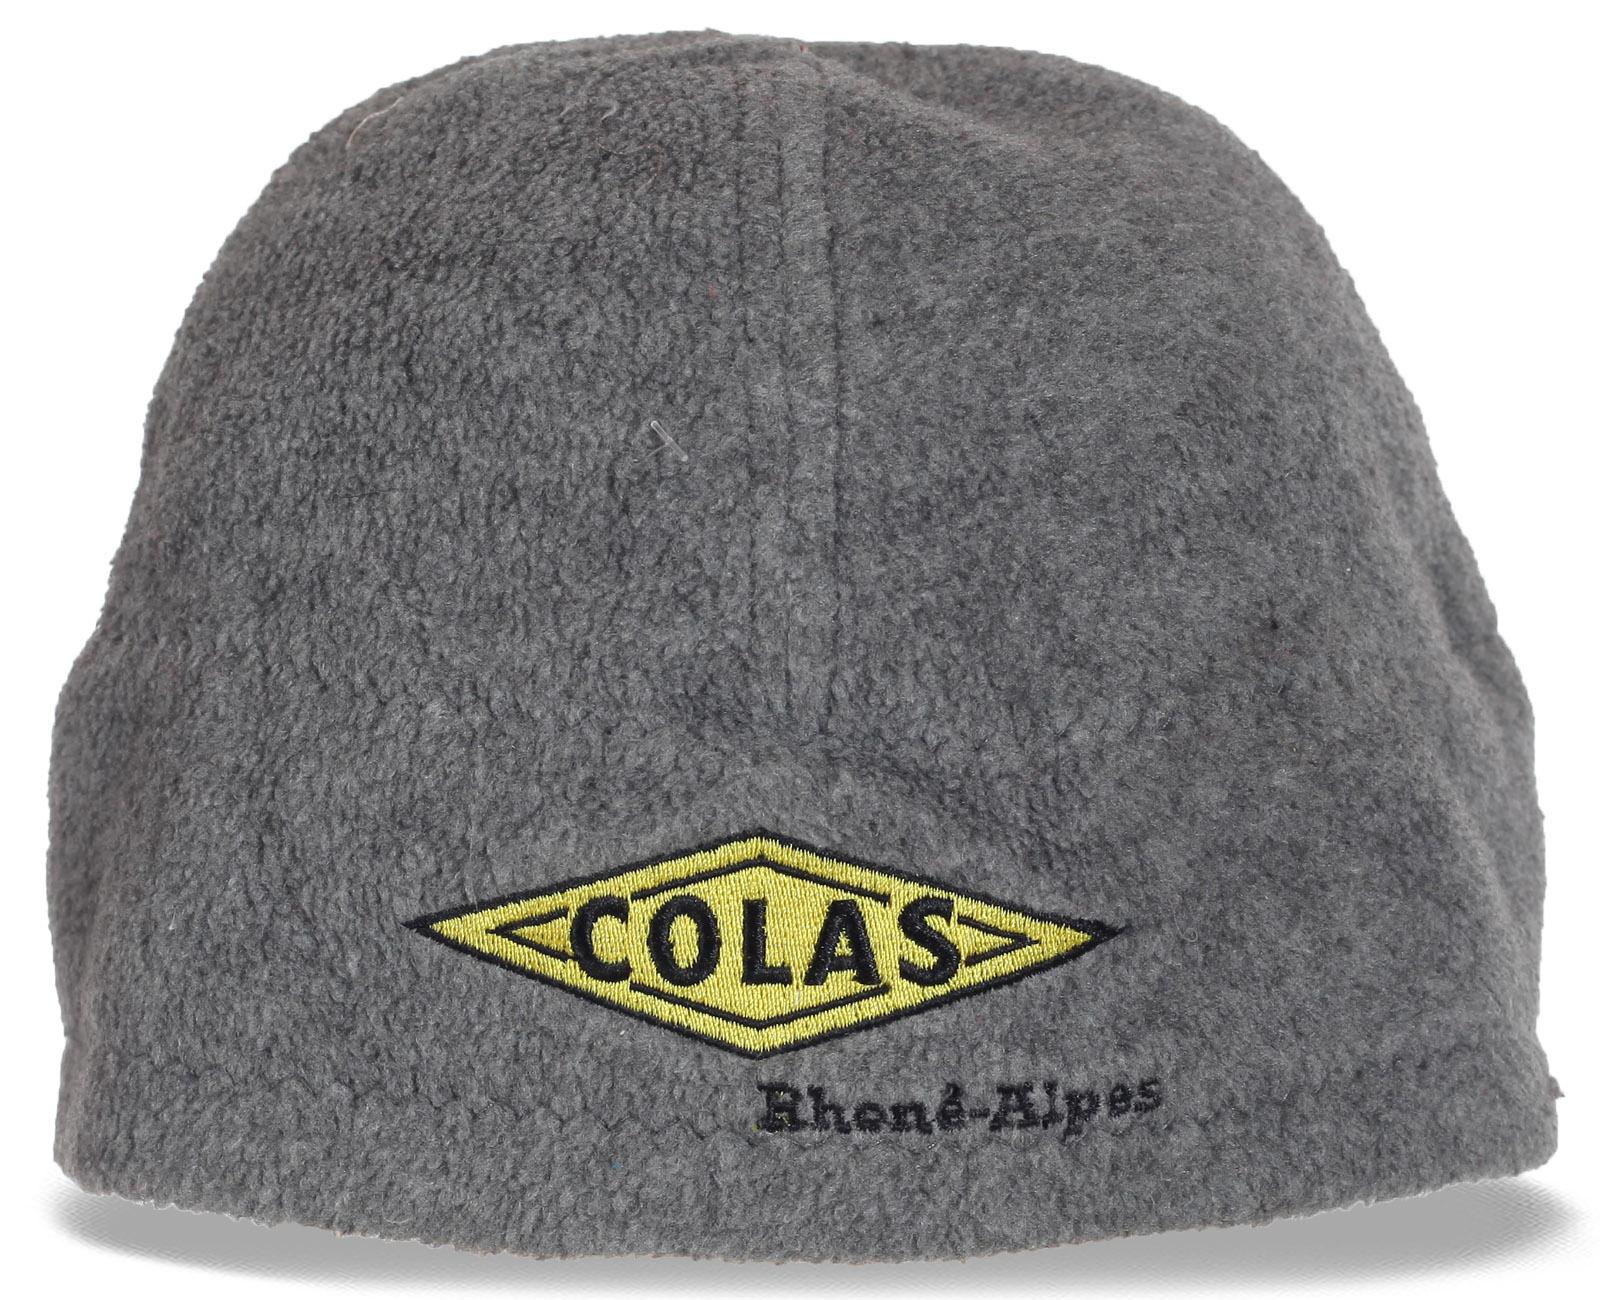 Зимняя мужская шапка Colas